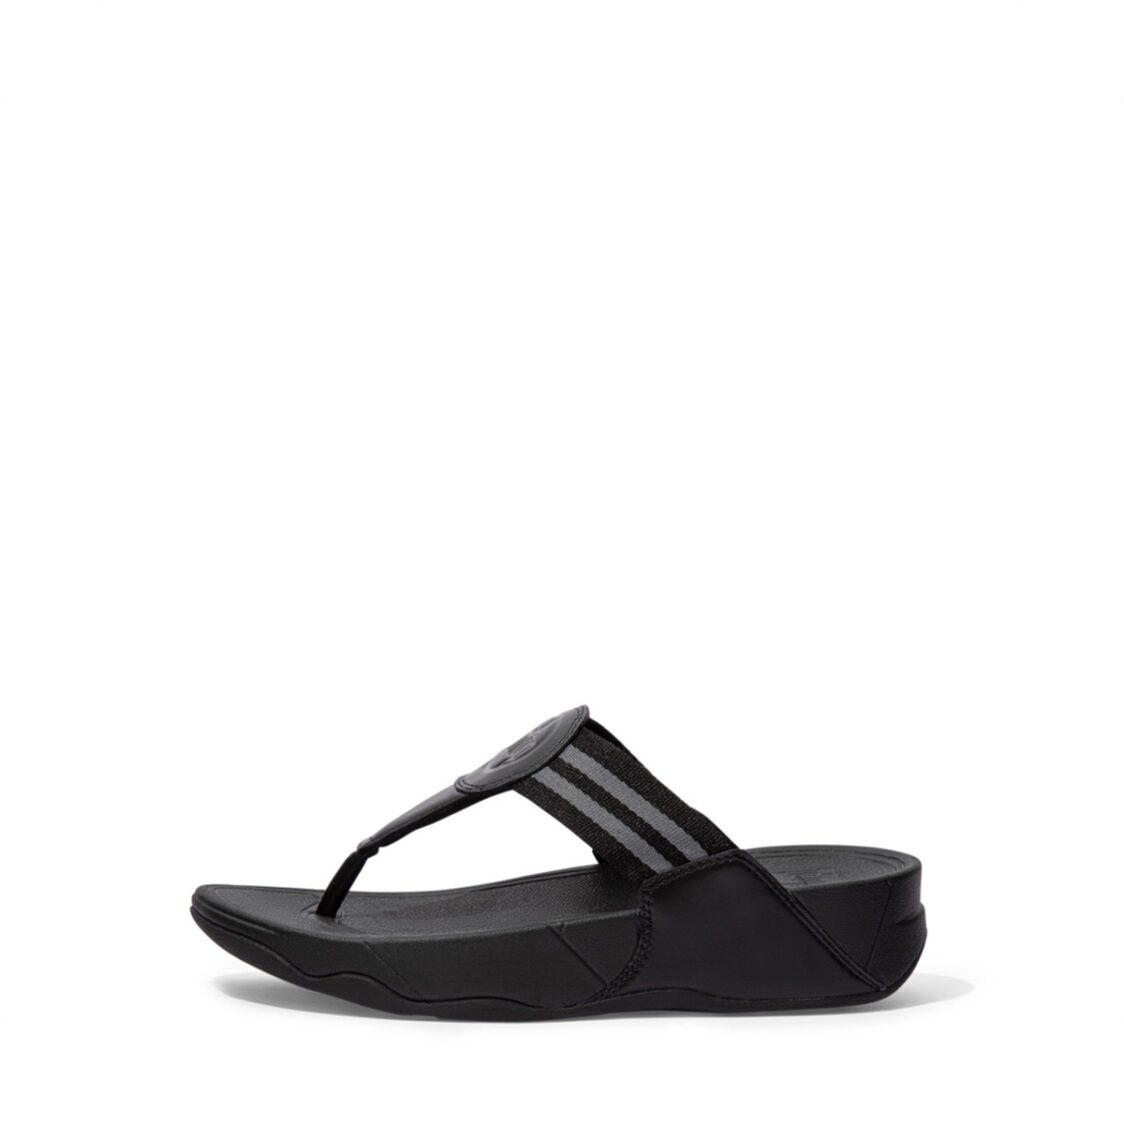 Fitflop Walkstar Toe-Post Sandals All Black Dx4-090